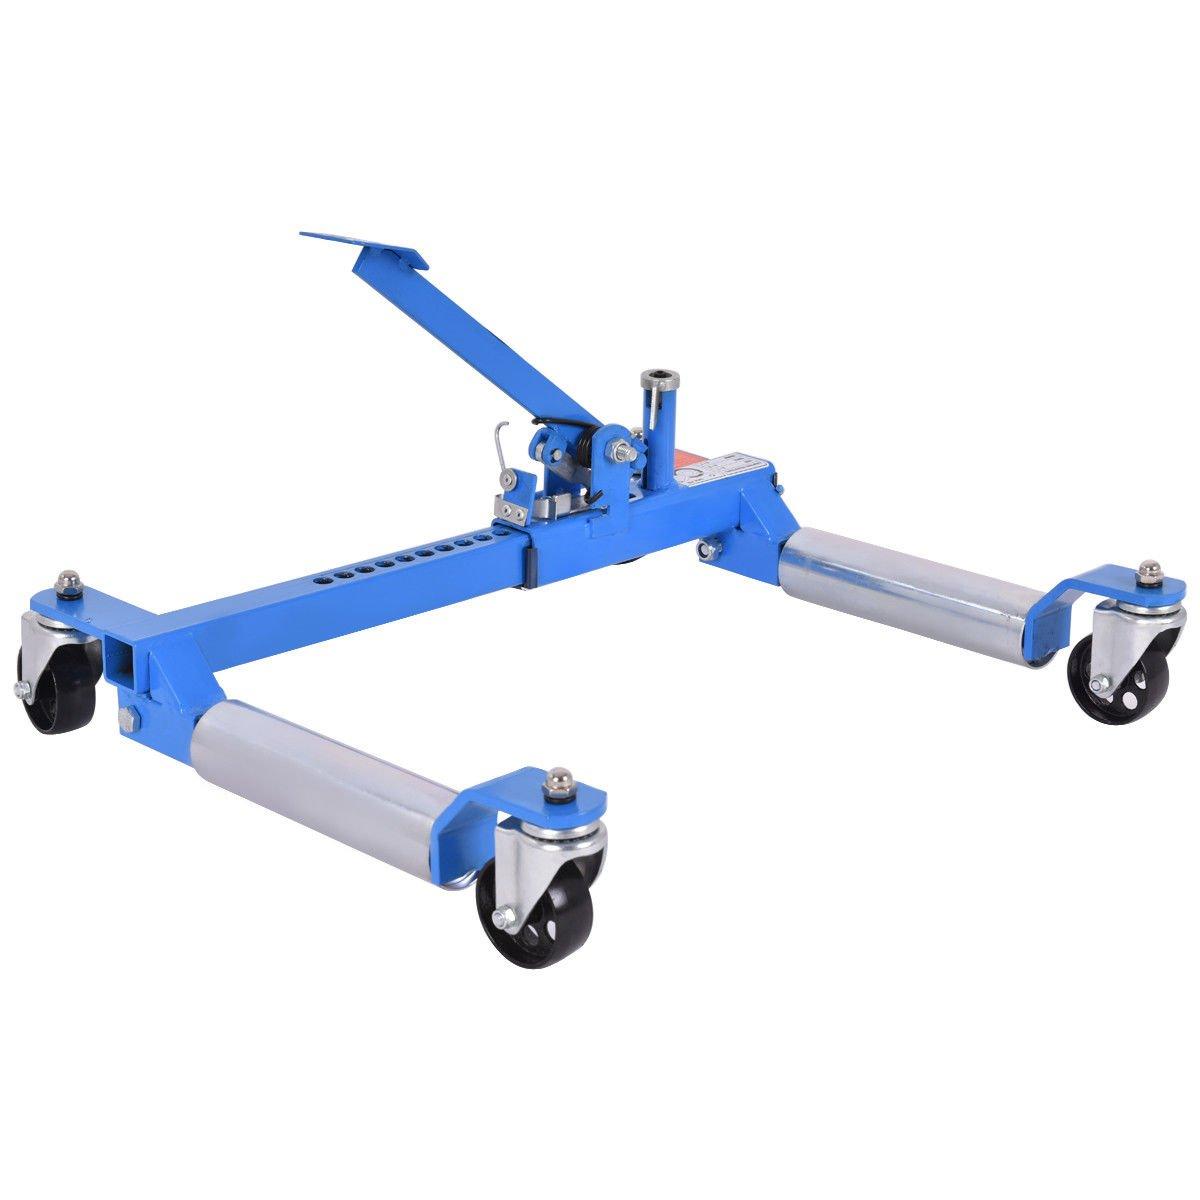 Goplus Wheel Dolly Car Skates Vehicle Positioning Hydraulic Tire Jack, 1250 lb (Blue) by Goplus (Image #6)